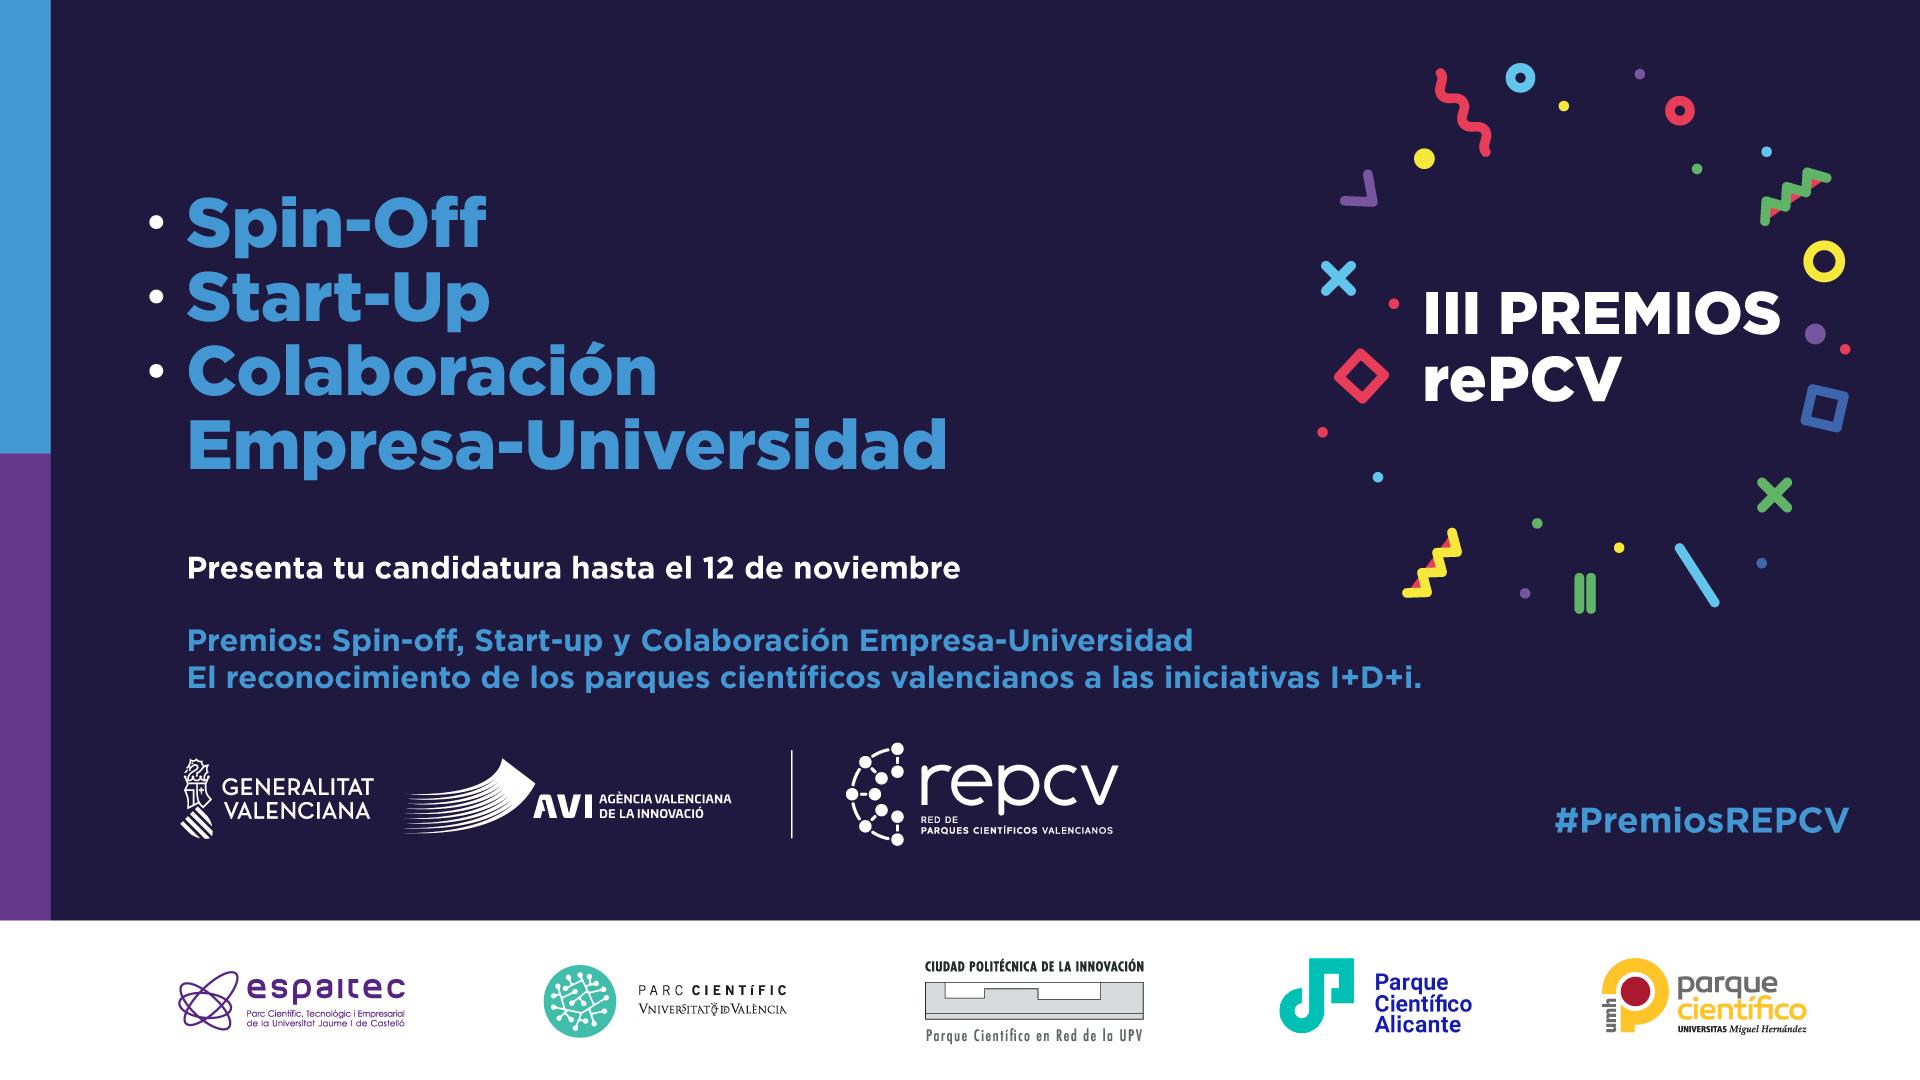 III premios RePCV